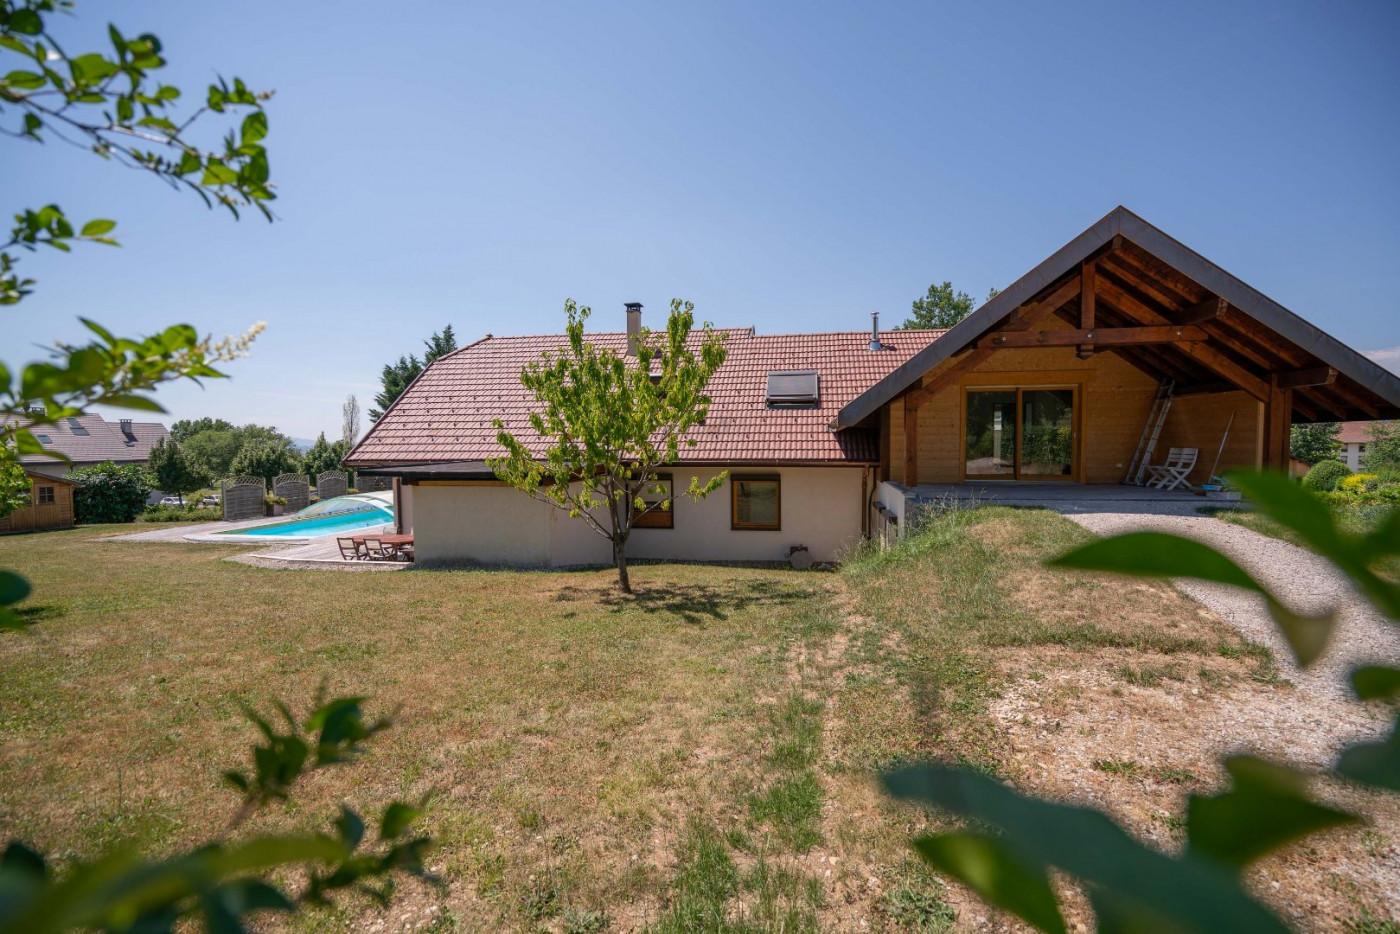 A vendre Villaz 7402365 Resonance immobilière